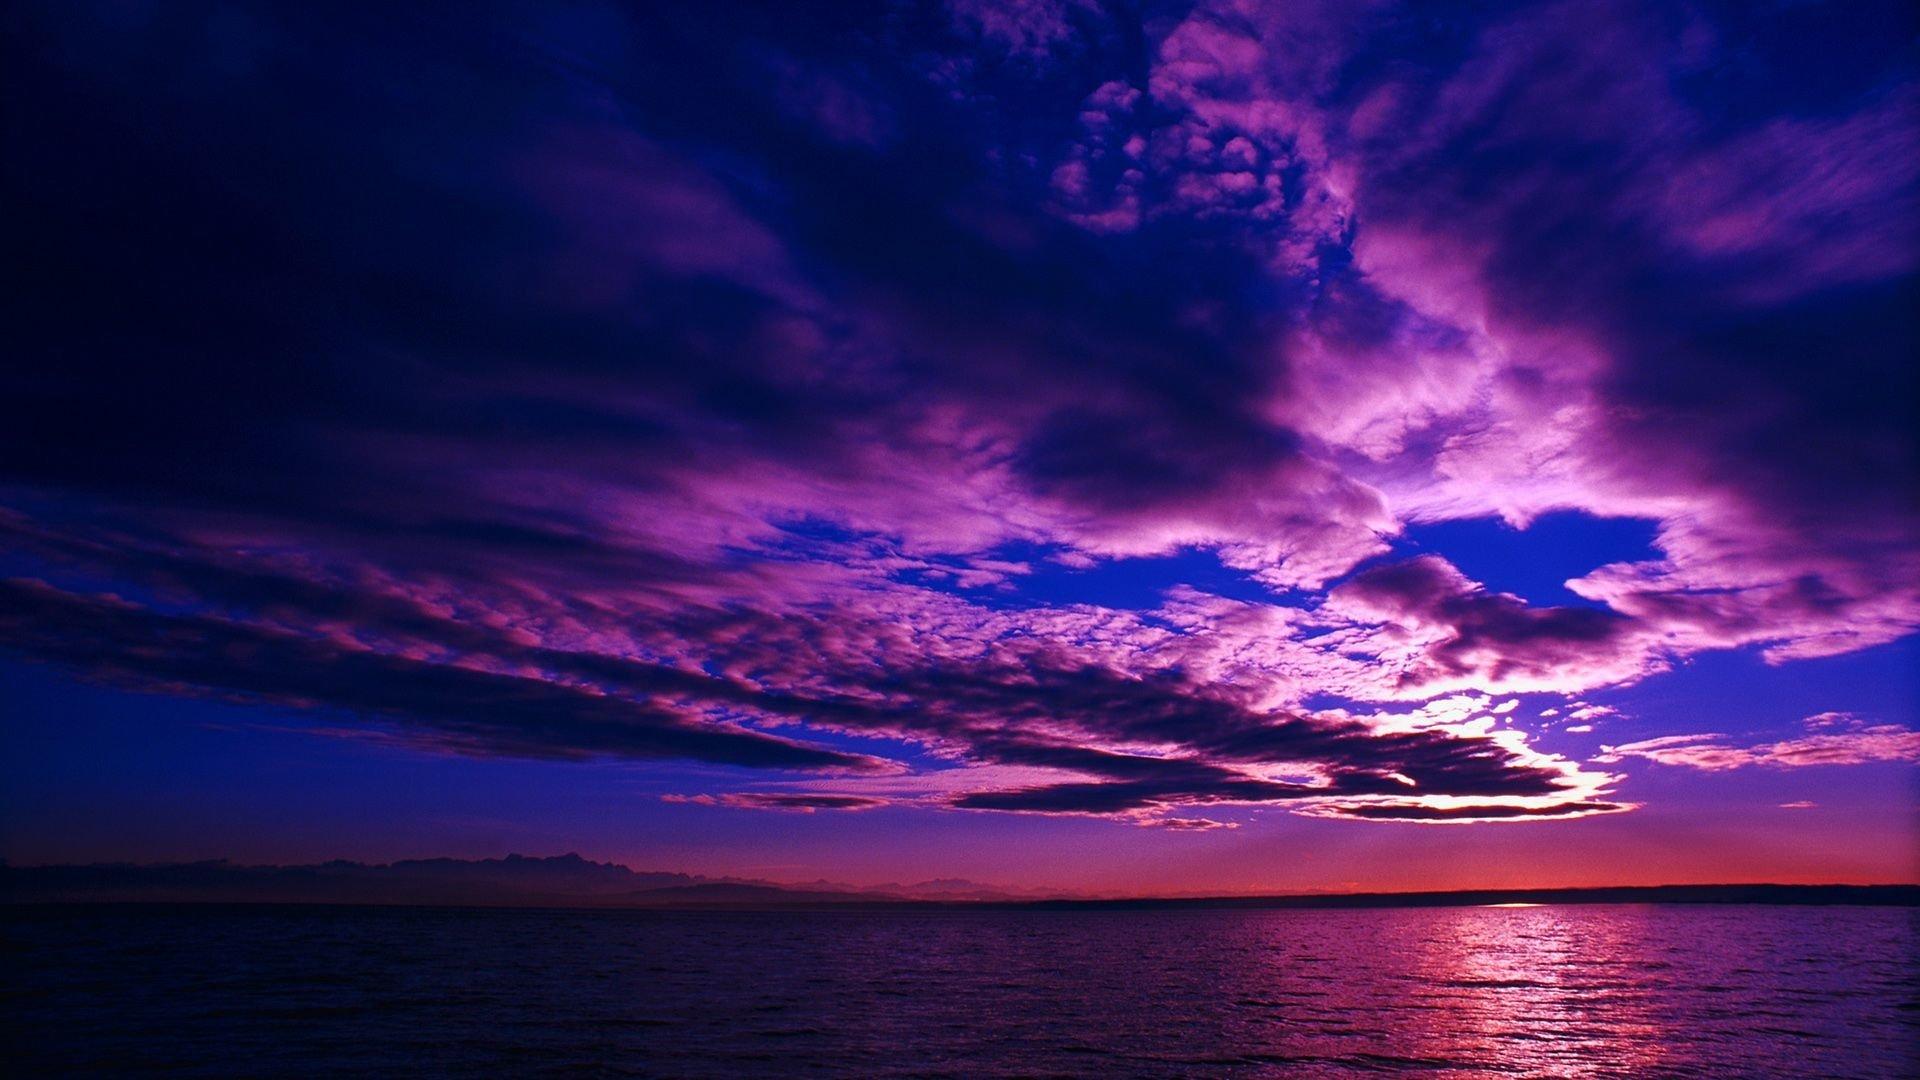 Purple Sunset Sky Hd Wallpaper Background Image 1920x1080 Id 692589 Wallpaper Abyss